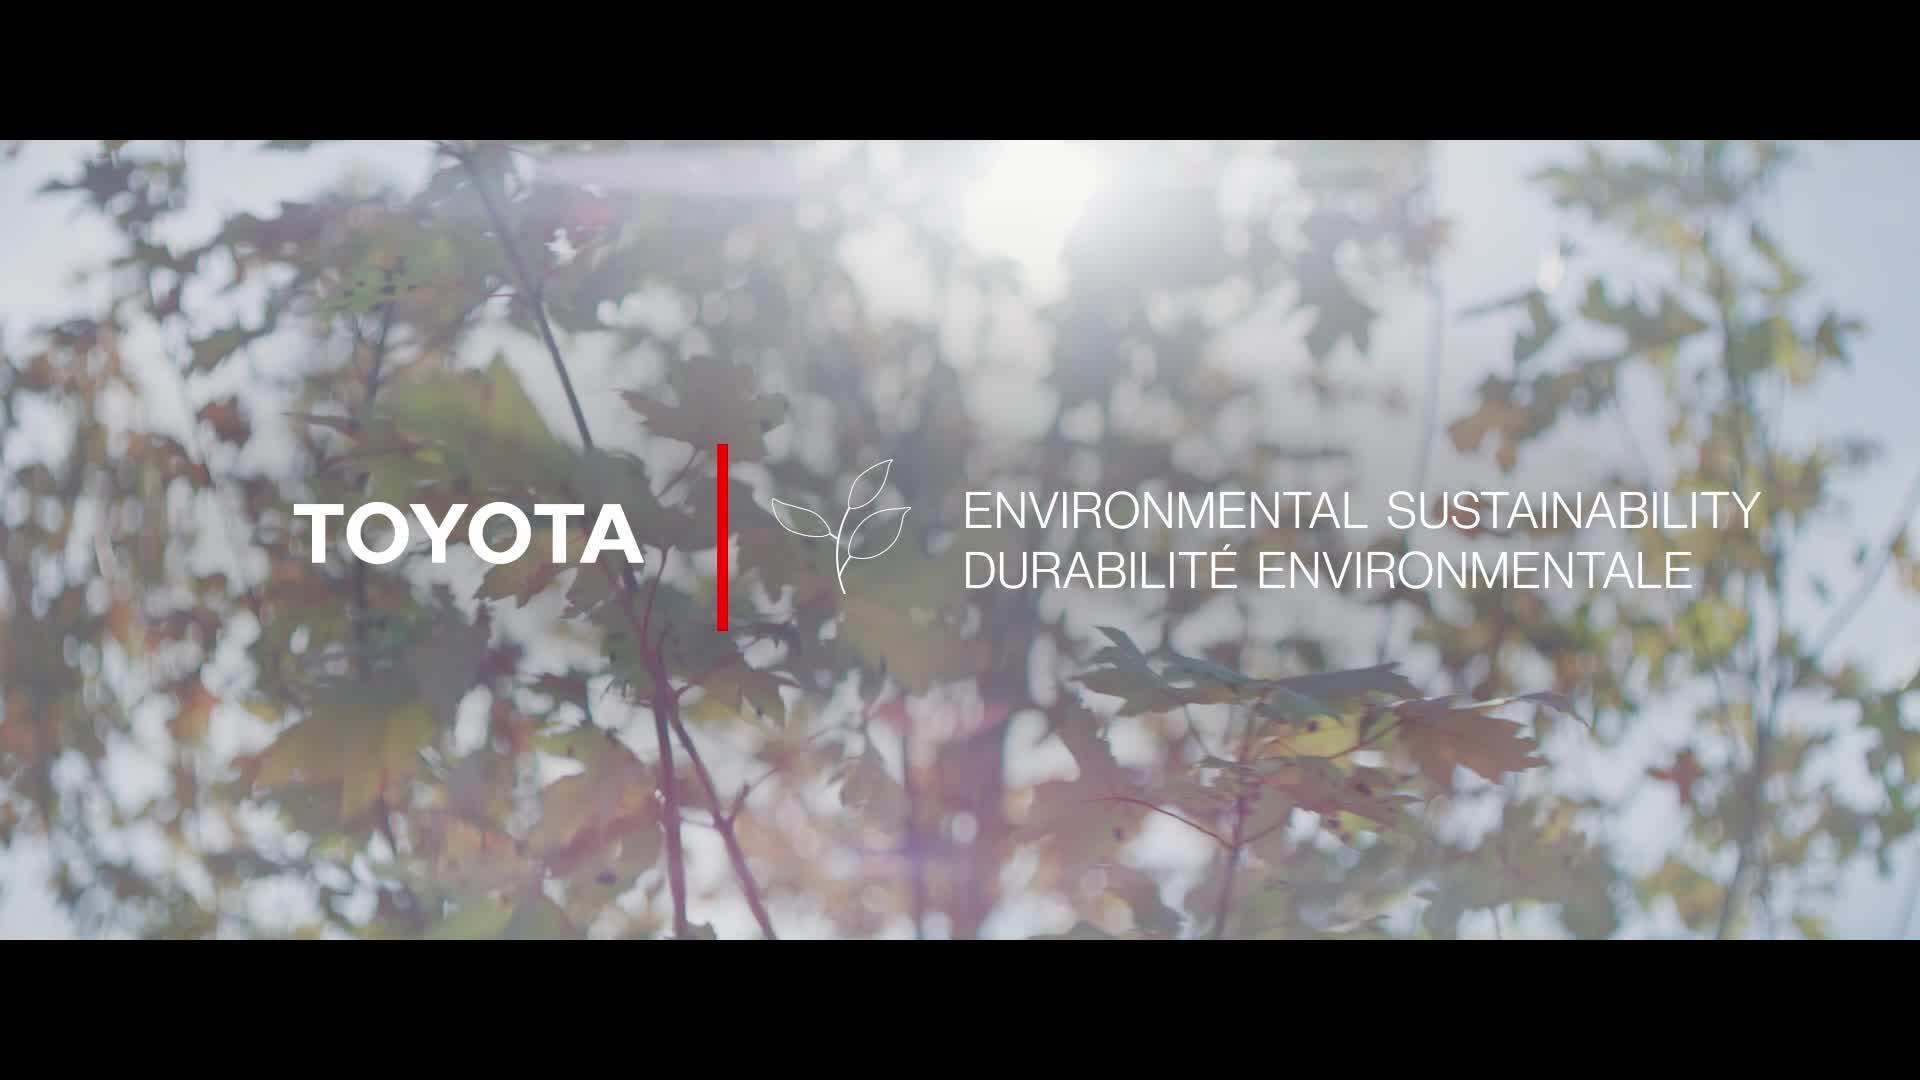 Toyota ECPDC - Durabilité environnementale